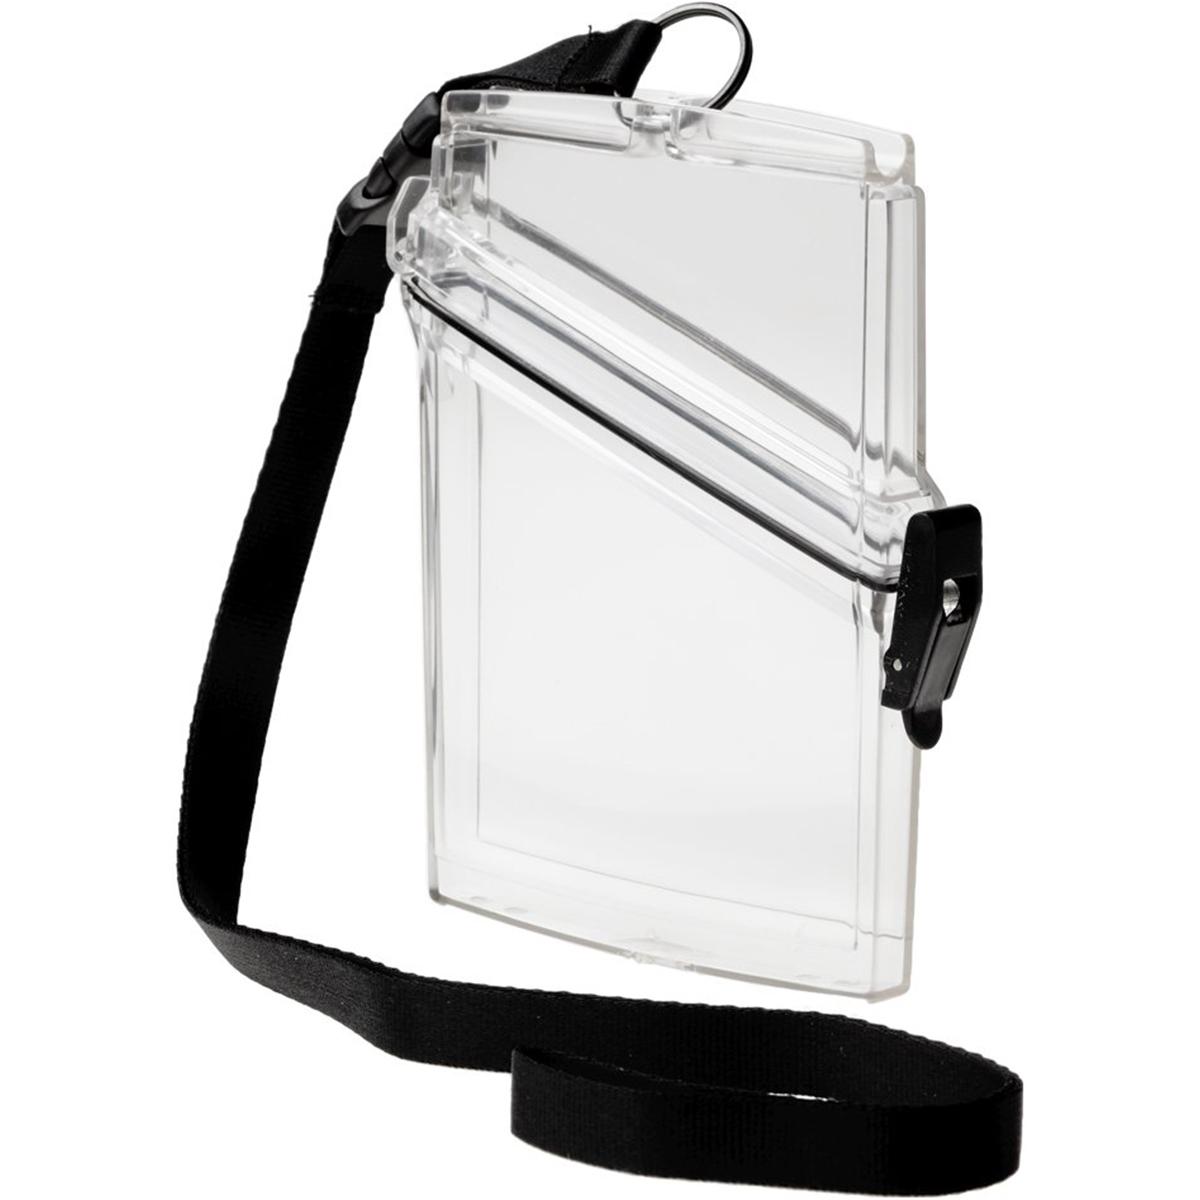 Witz-Passport-Locker-Lightweight-Waterproof-Sport-Case-with-Lanyard miniature 7